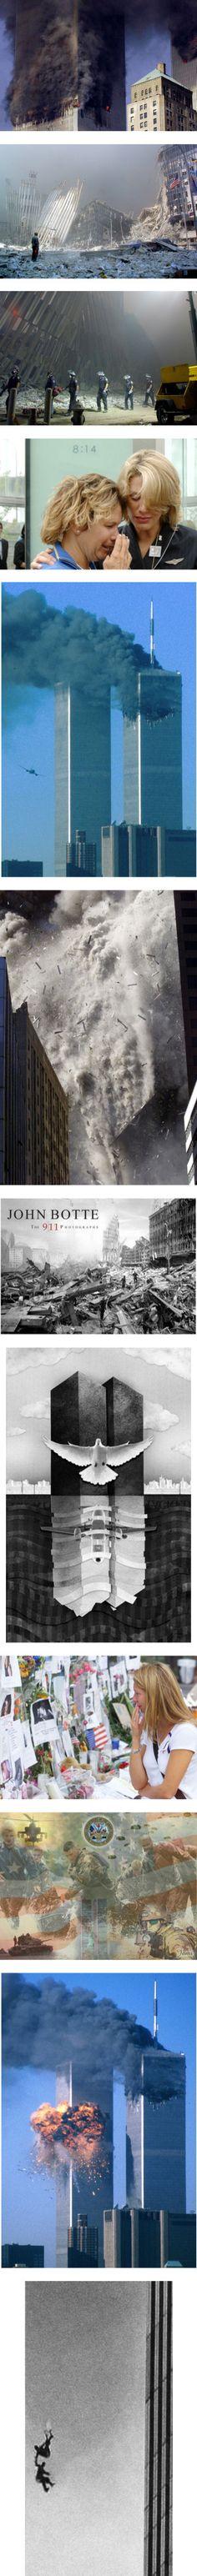 """Remember 9/11 - Never Forgotten;"" by ilyforeverandever ❤ liked on Polyvore"